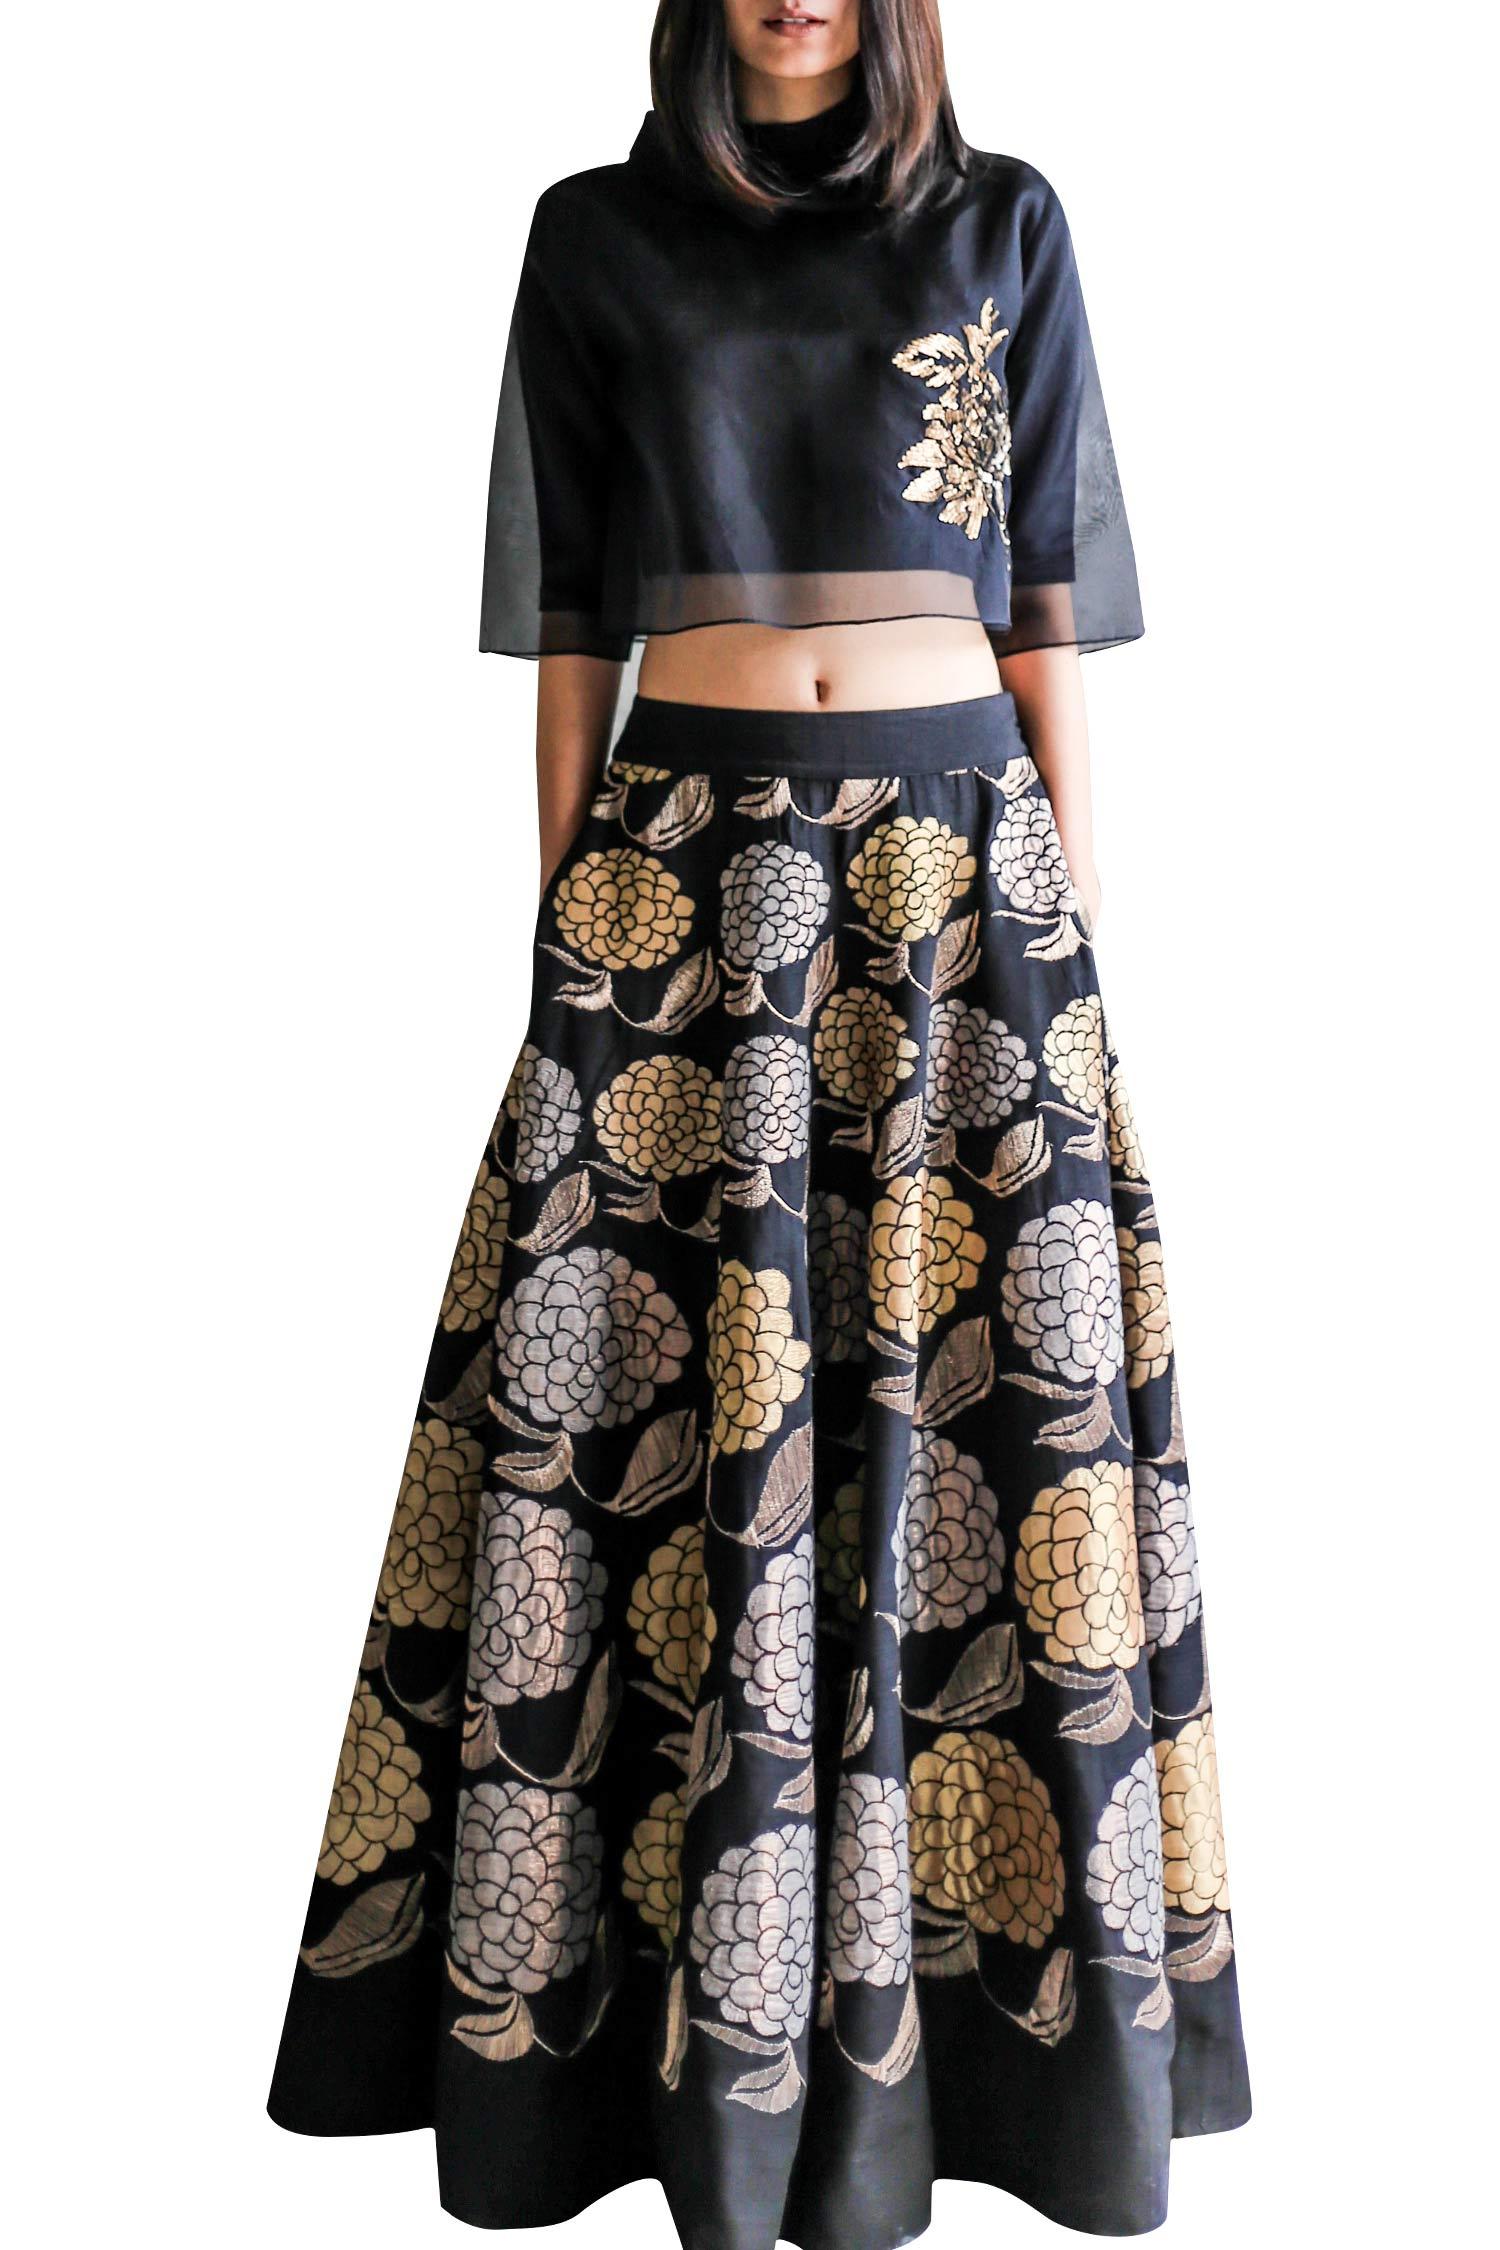 aa8d5574ce Black high waist skirt with organza sequin crop top - Clothing